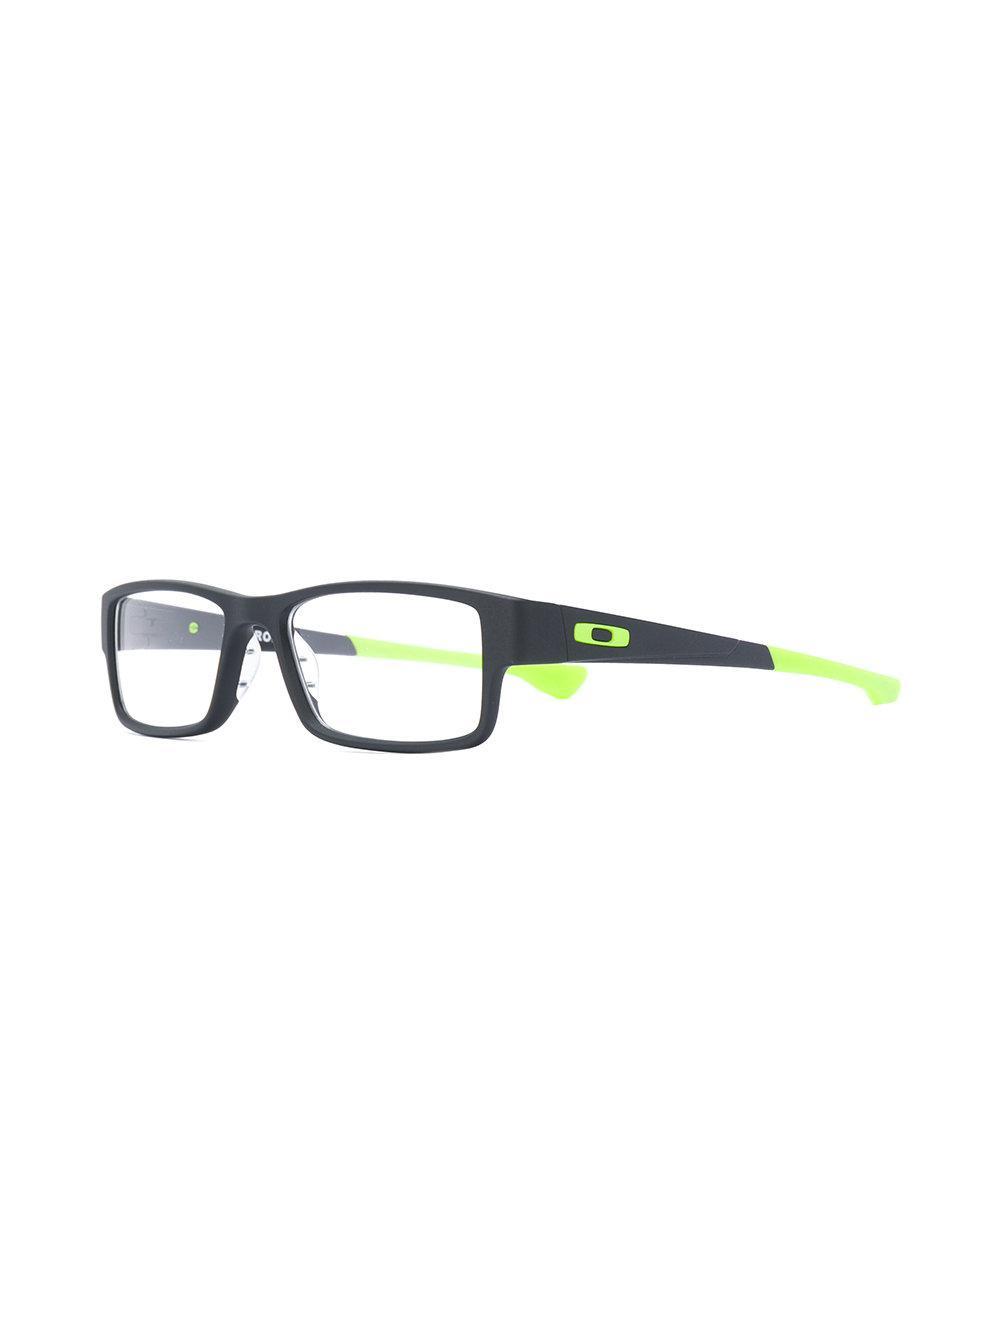 5cbe561e06 Lyst - Oakley Airdrop Glasses in Black for Men